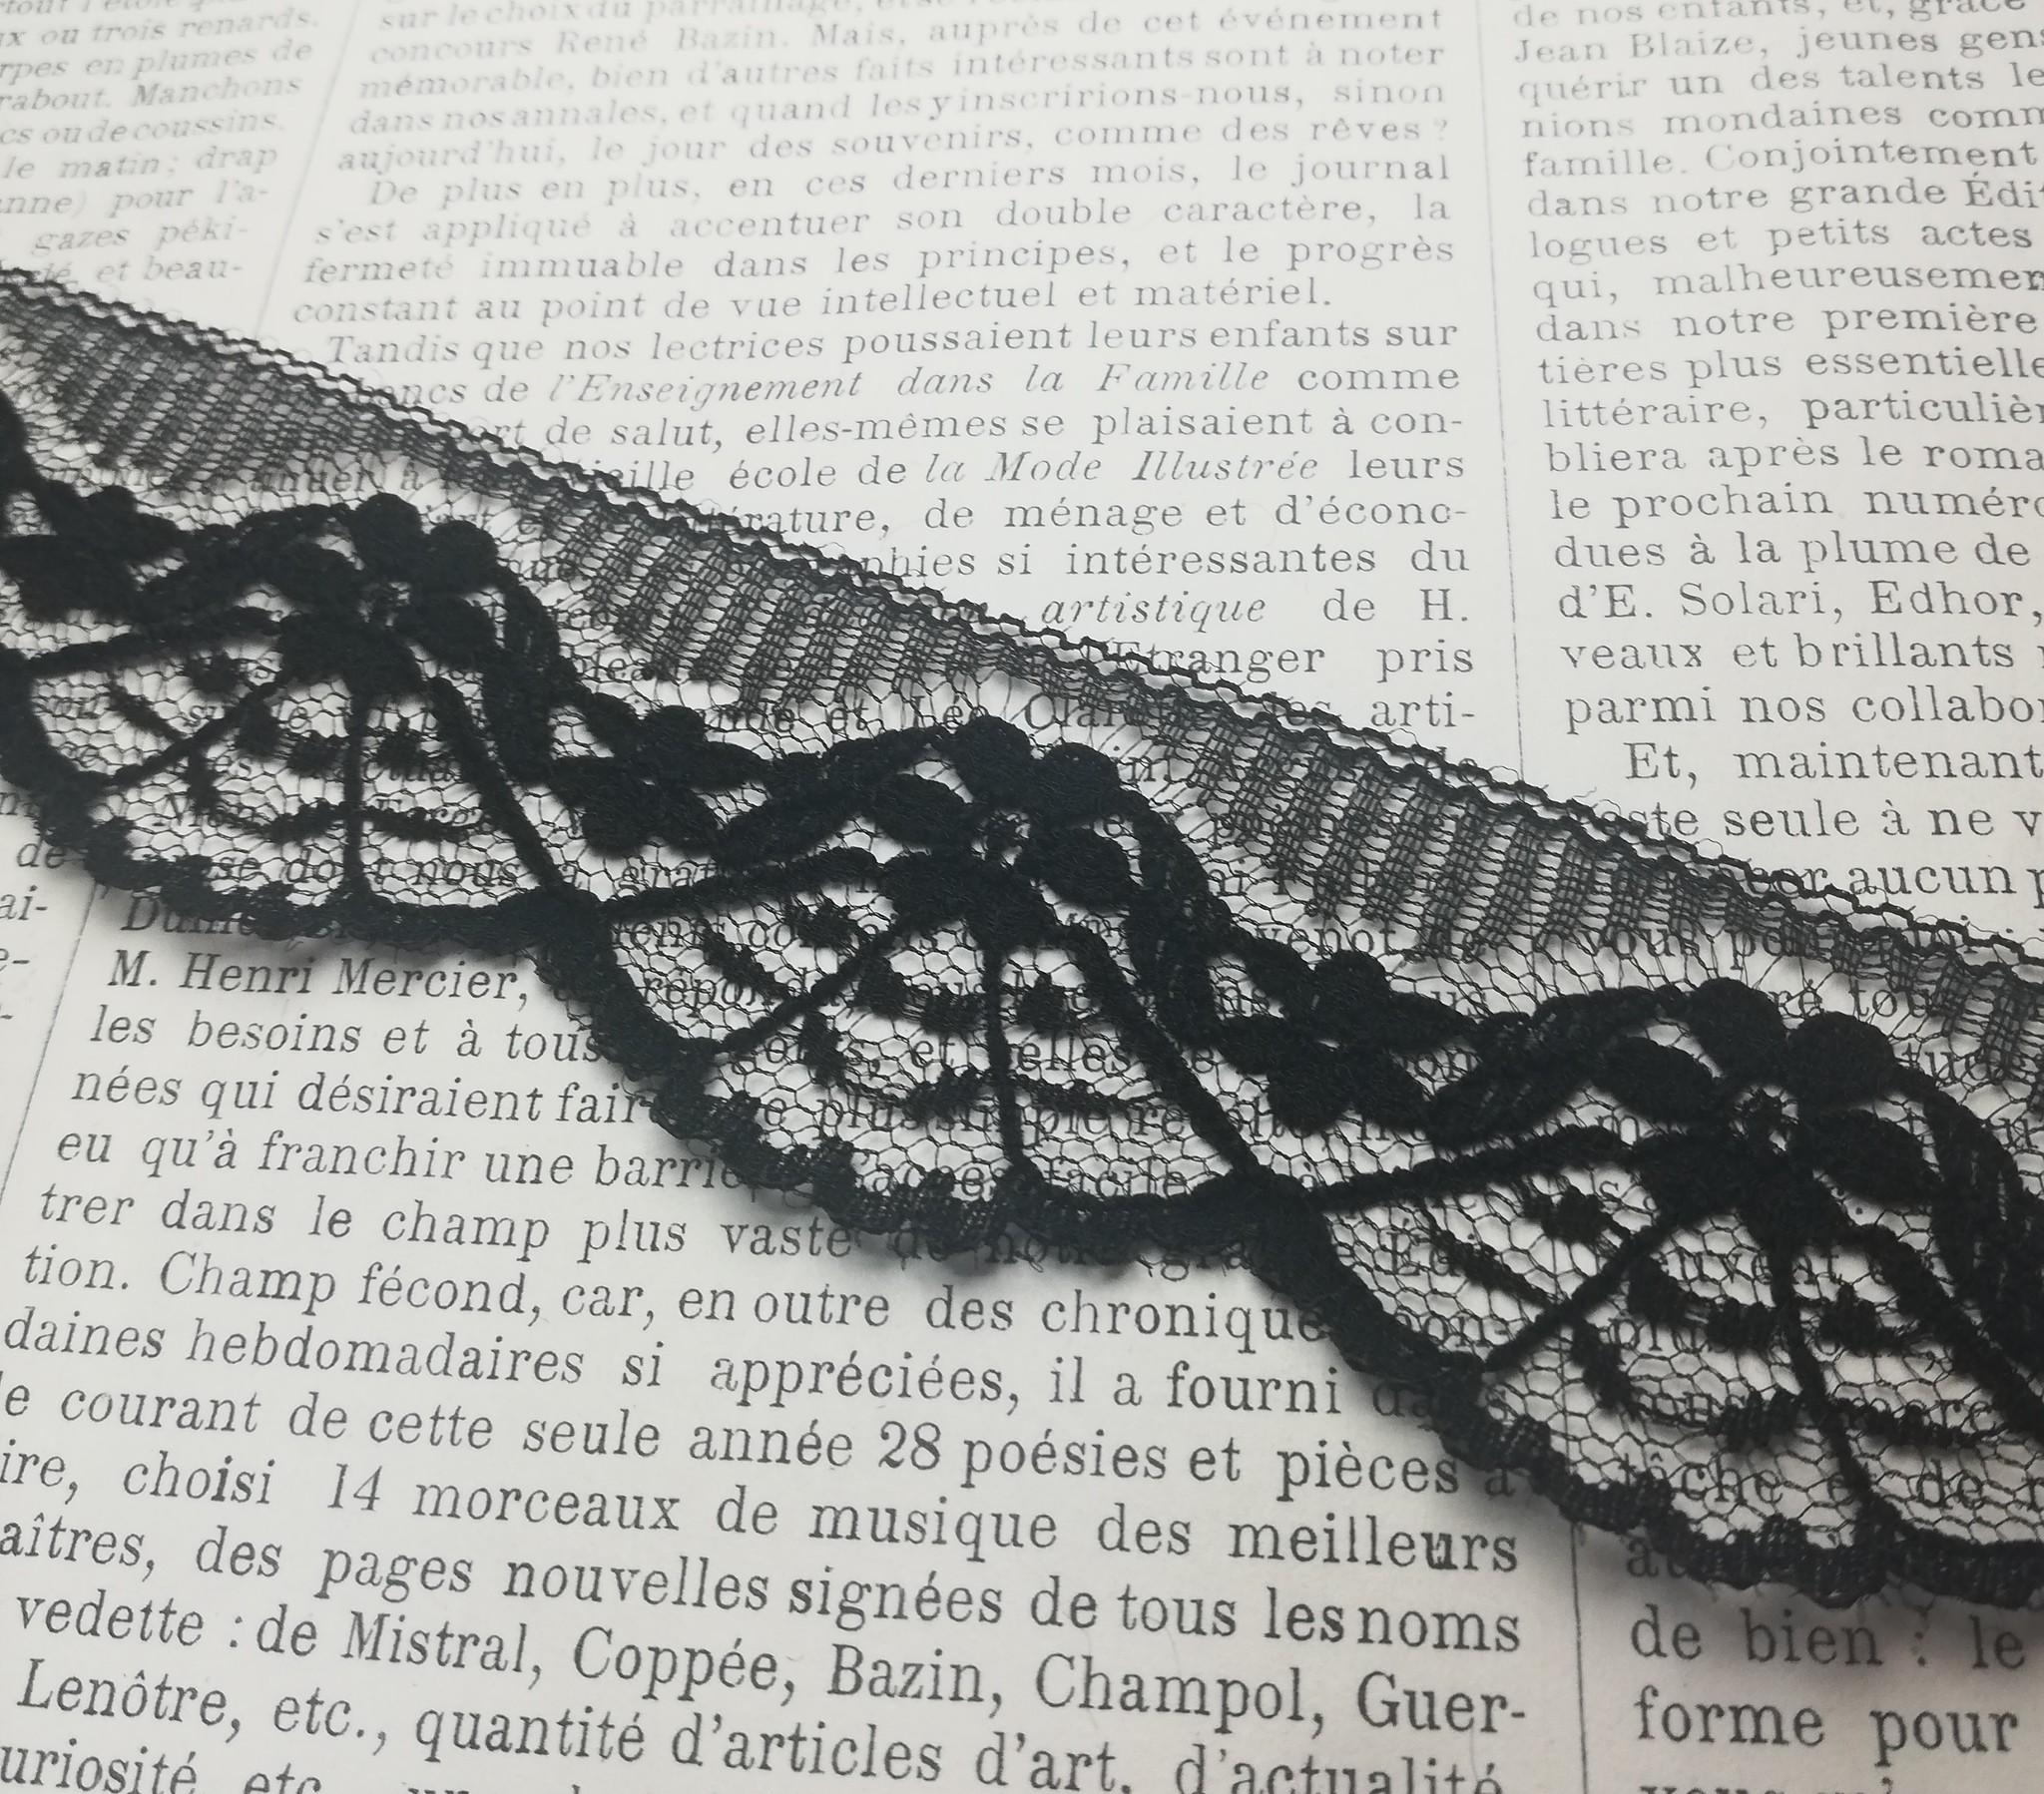 Black Scalloped Lace  with Fan pattern